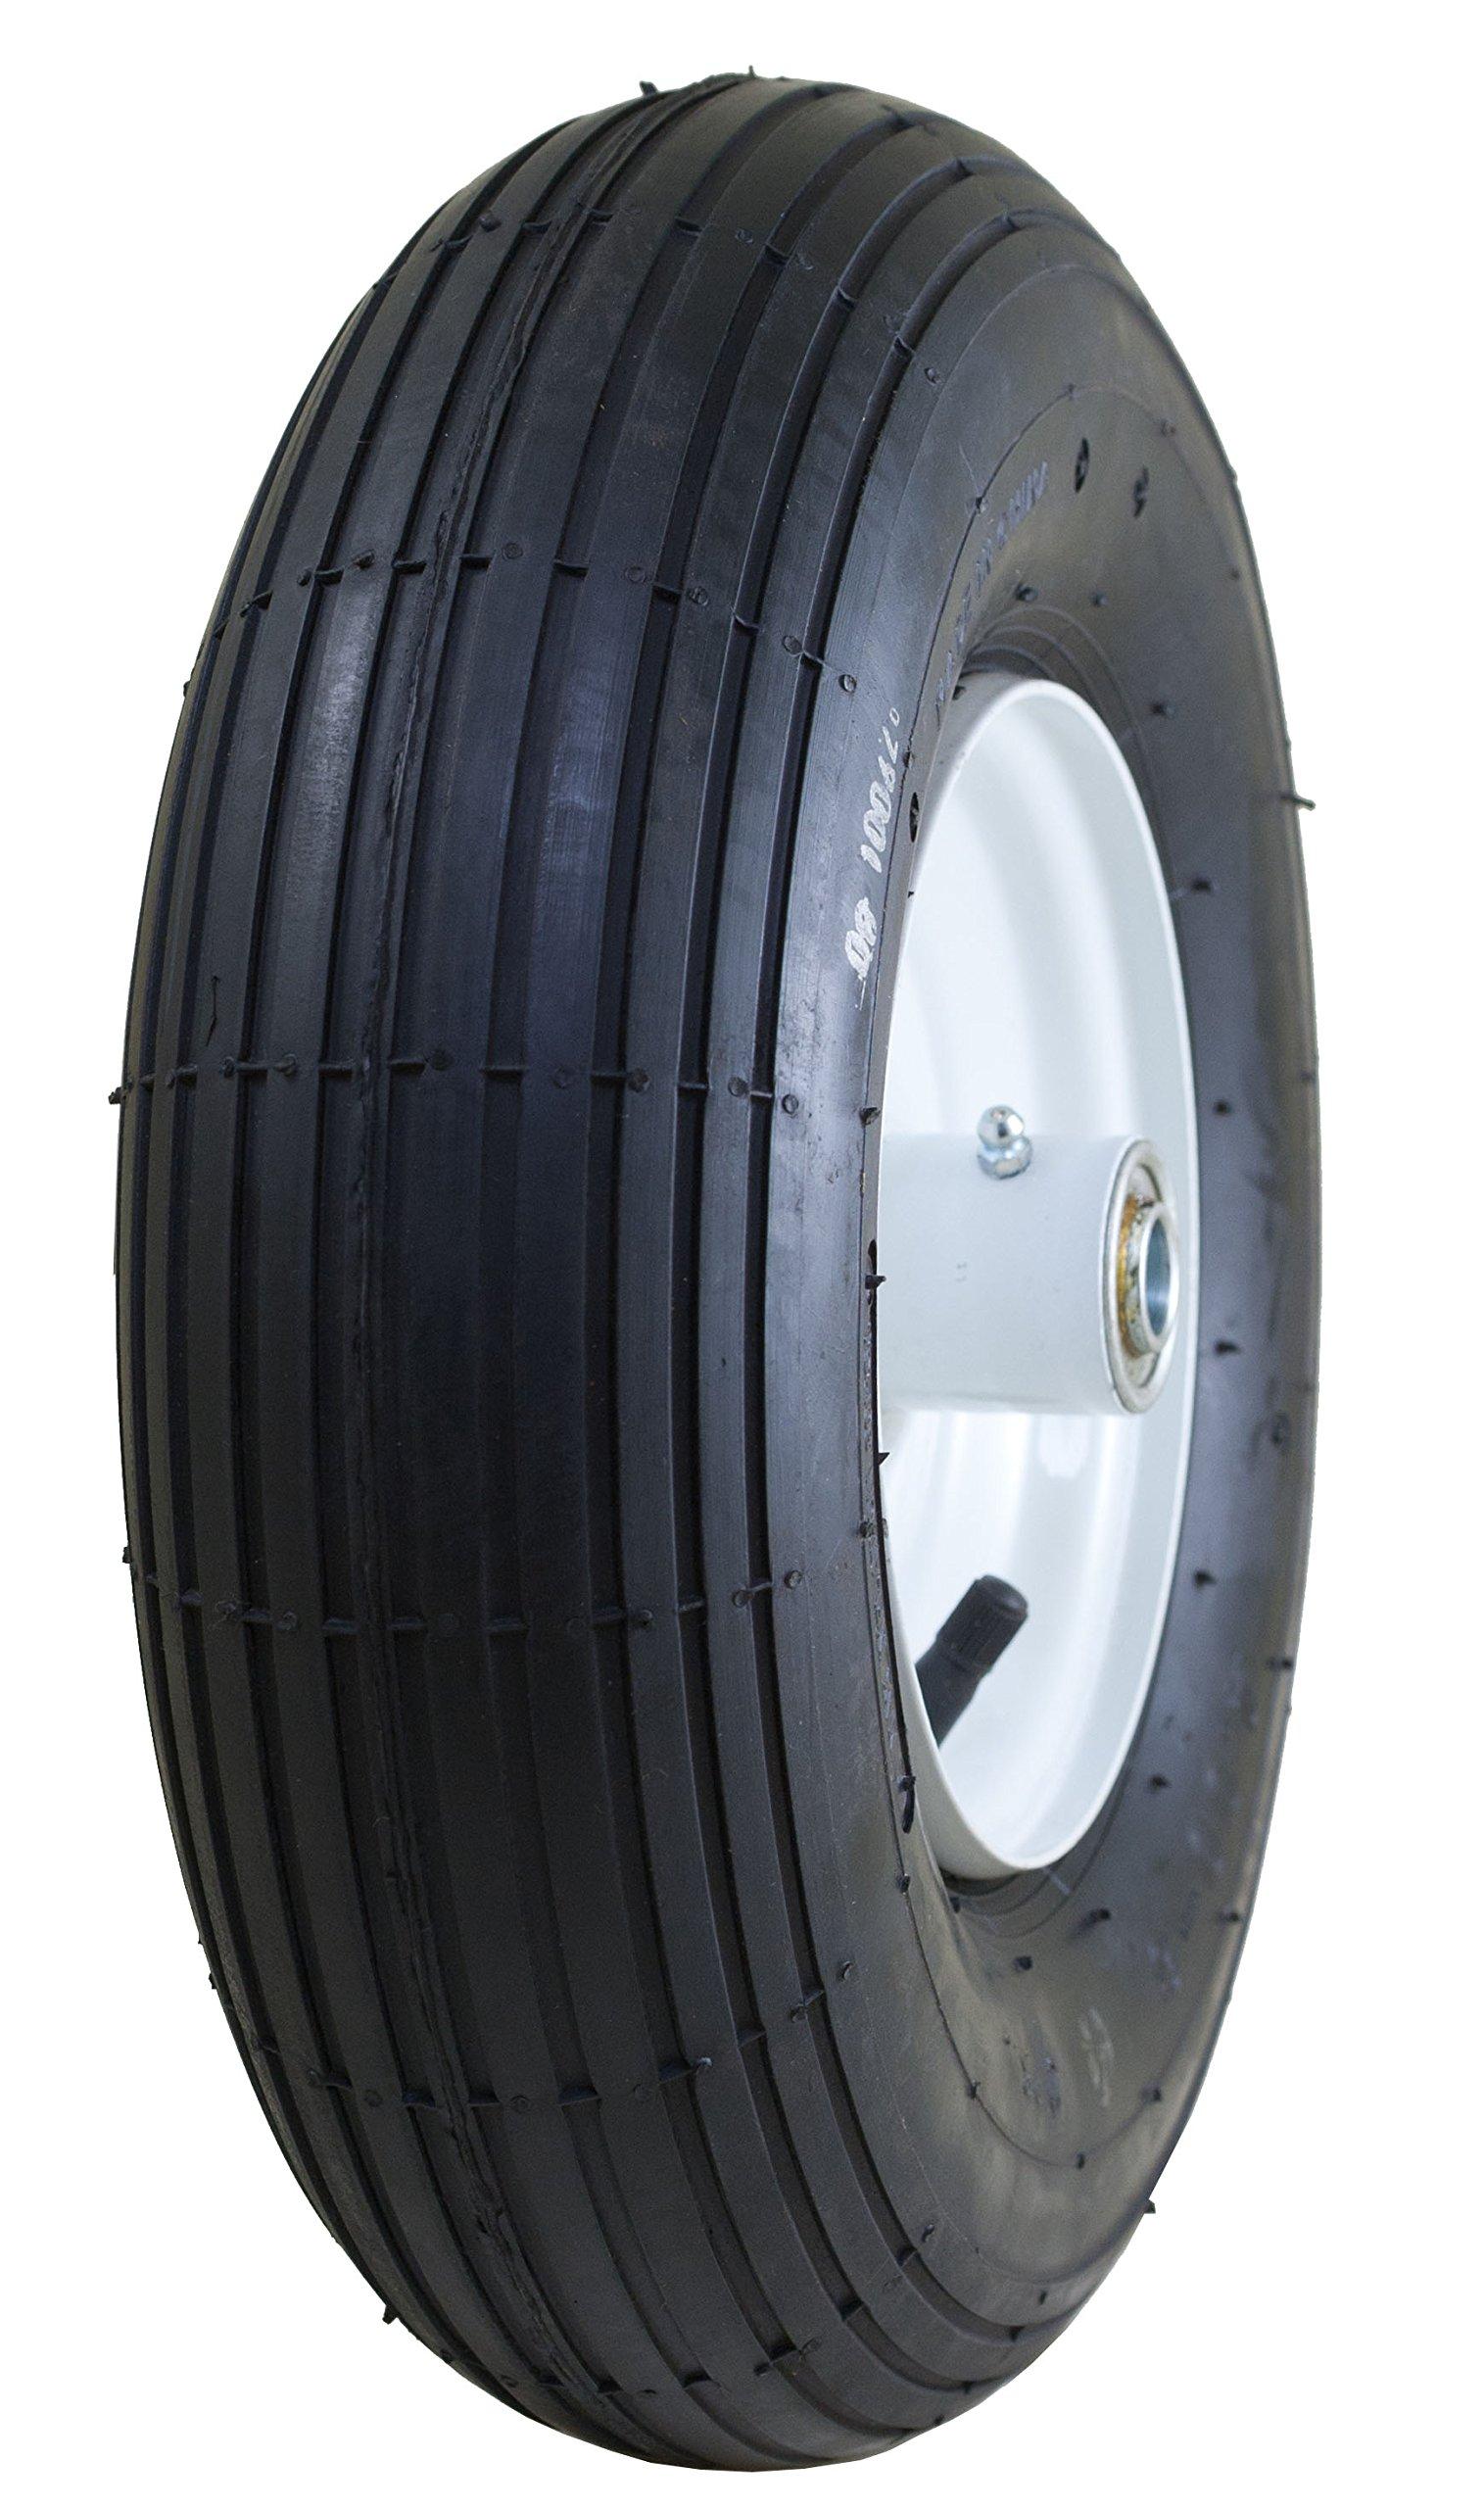 Marathon 4.00-6'' Pneumatic (Air Filled) Tire on Wheel, 3'' Hub, 5/8'' Bearings by Marathon Industries